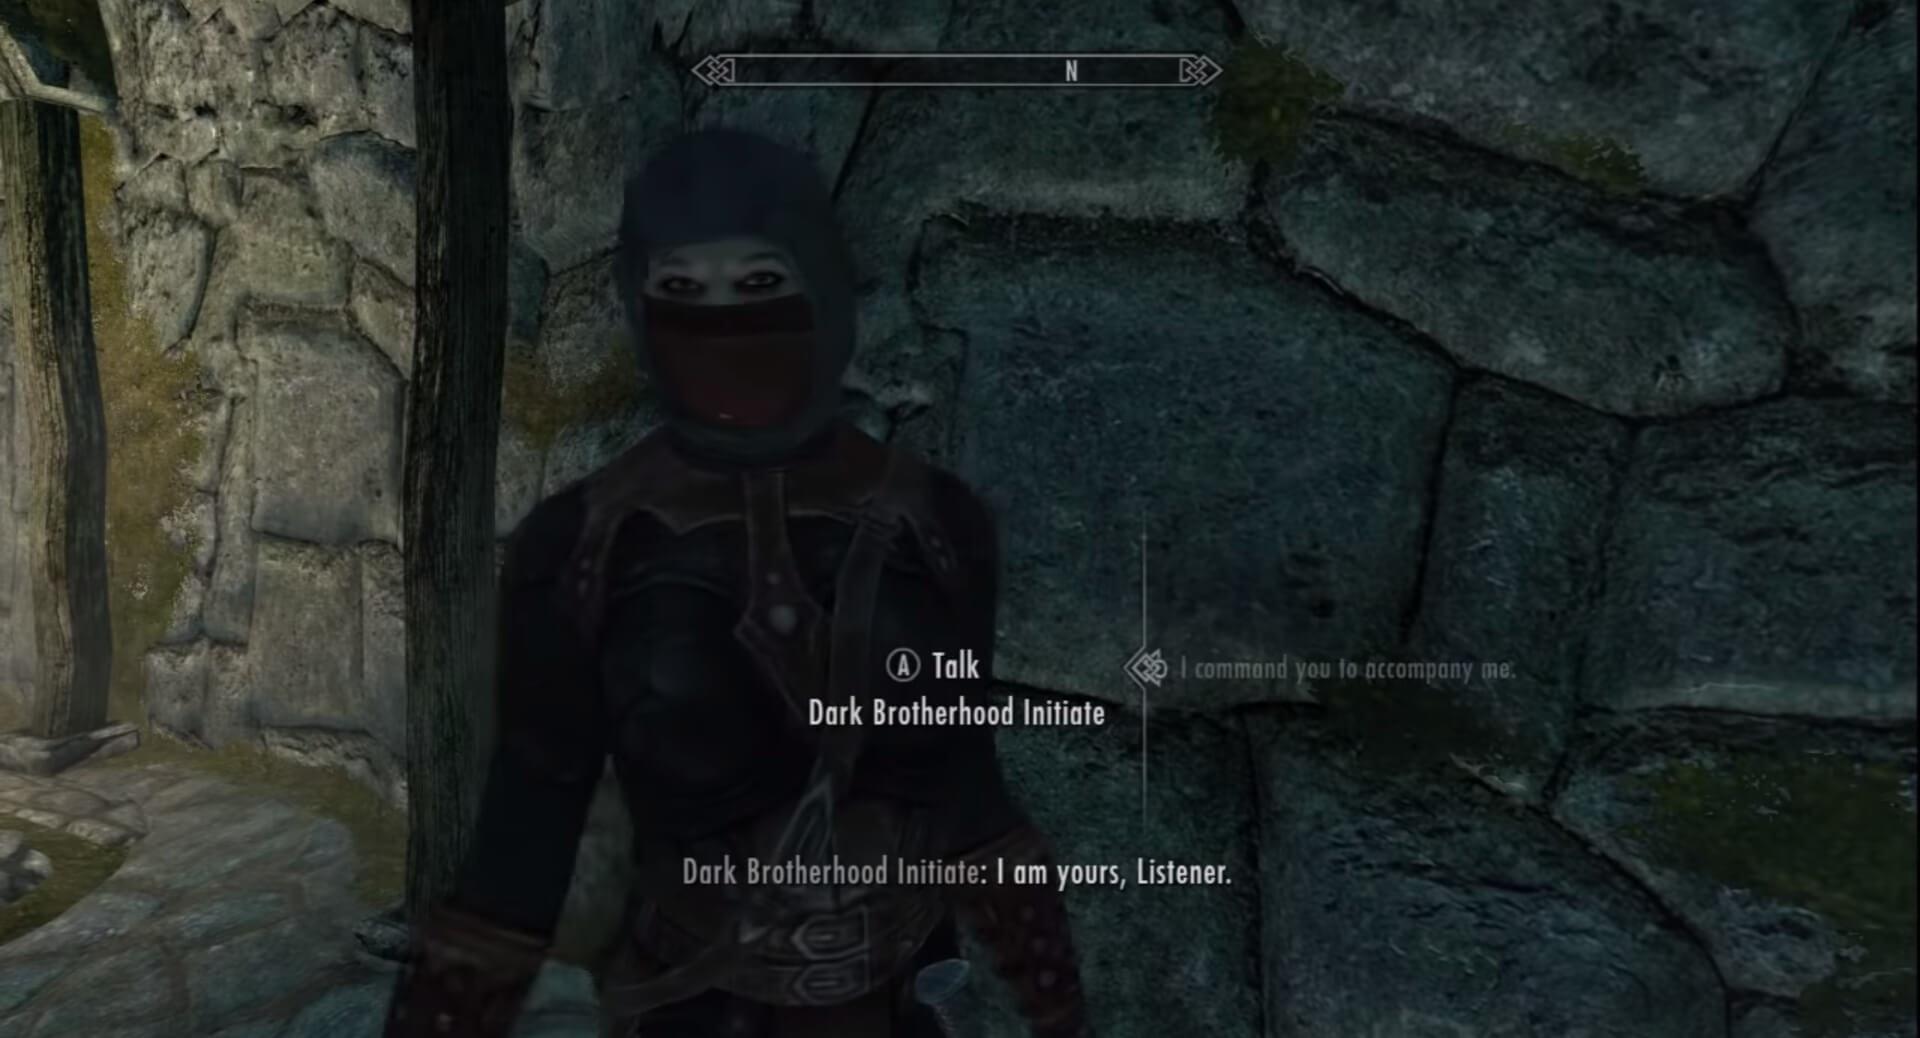 Dark Brotherhood Initiate skyrim followers